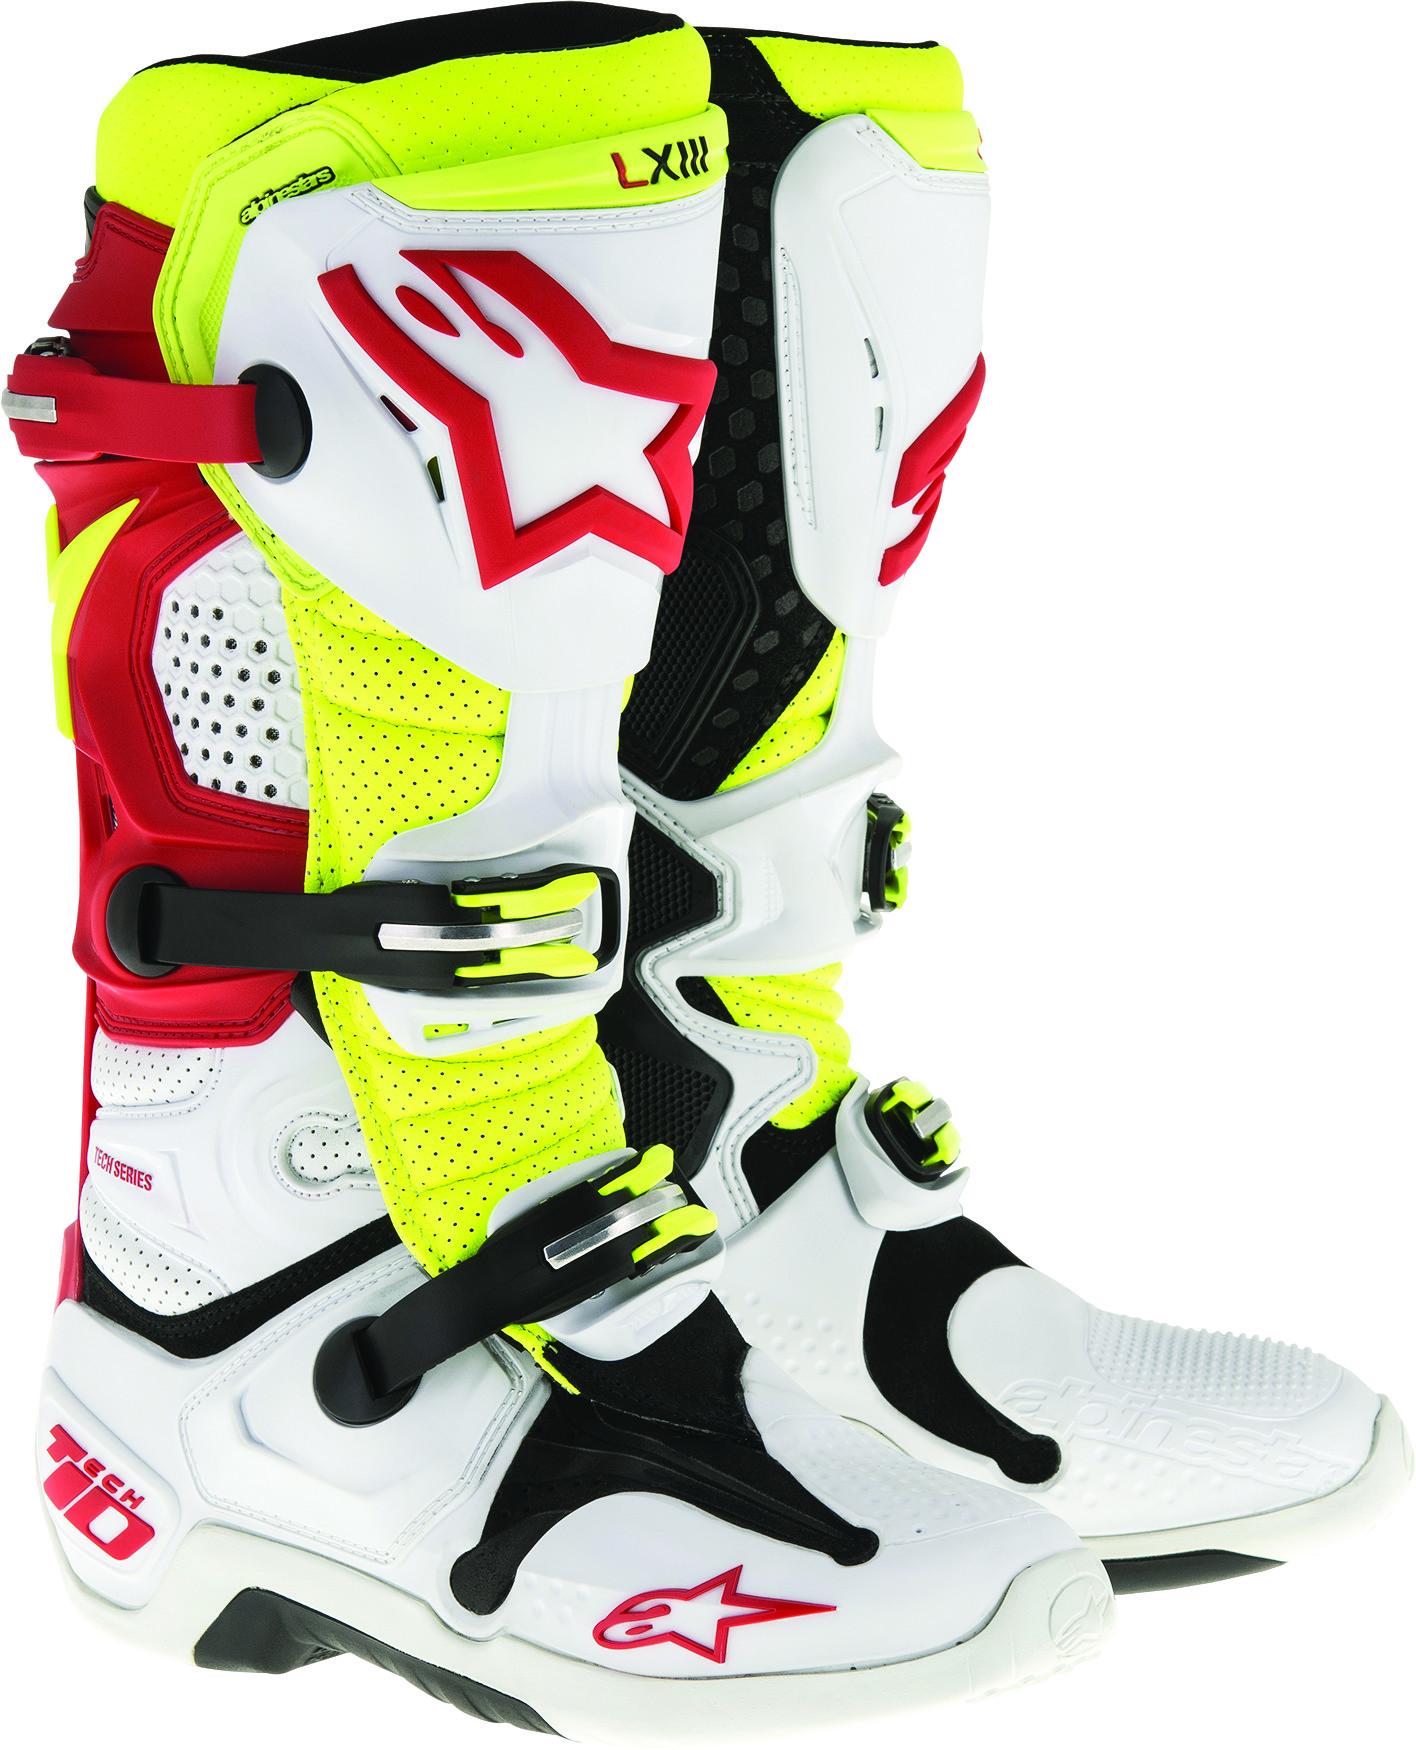 Tech 10 Boots White/Red/Yellow Sz 10